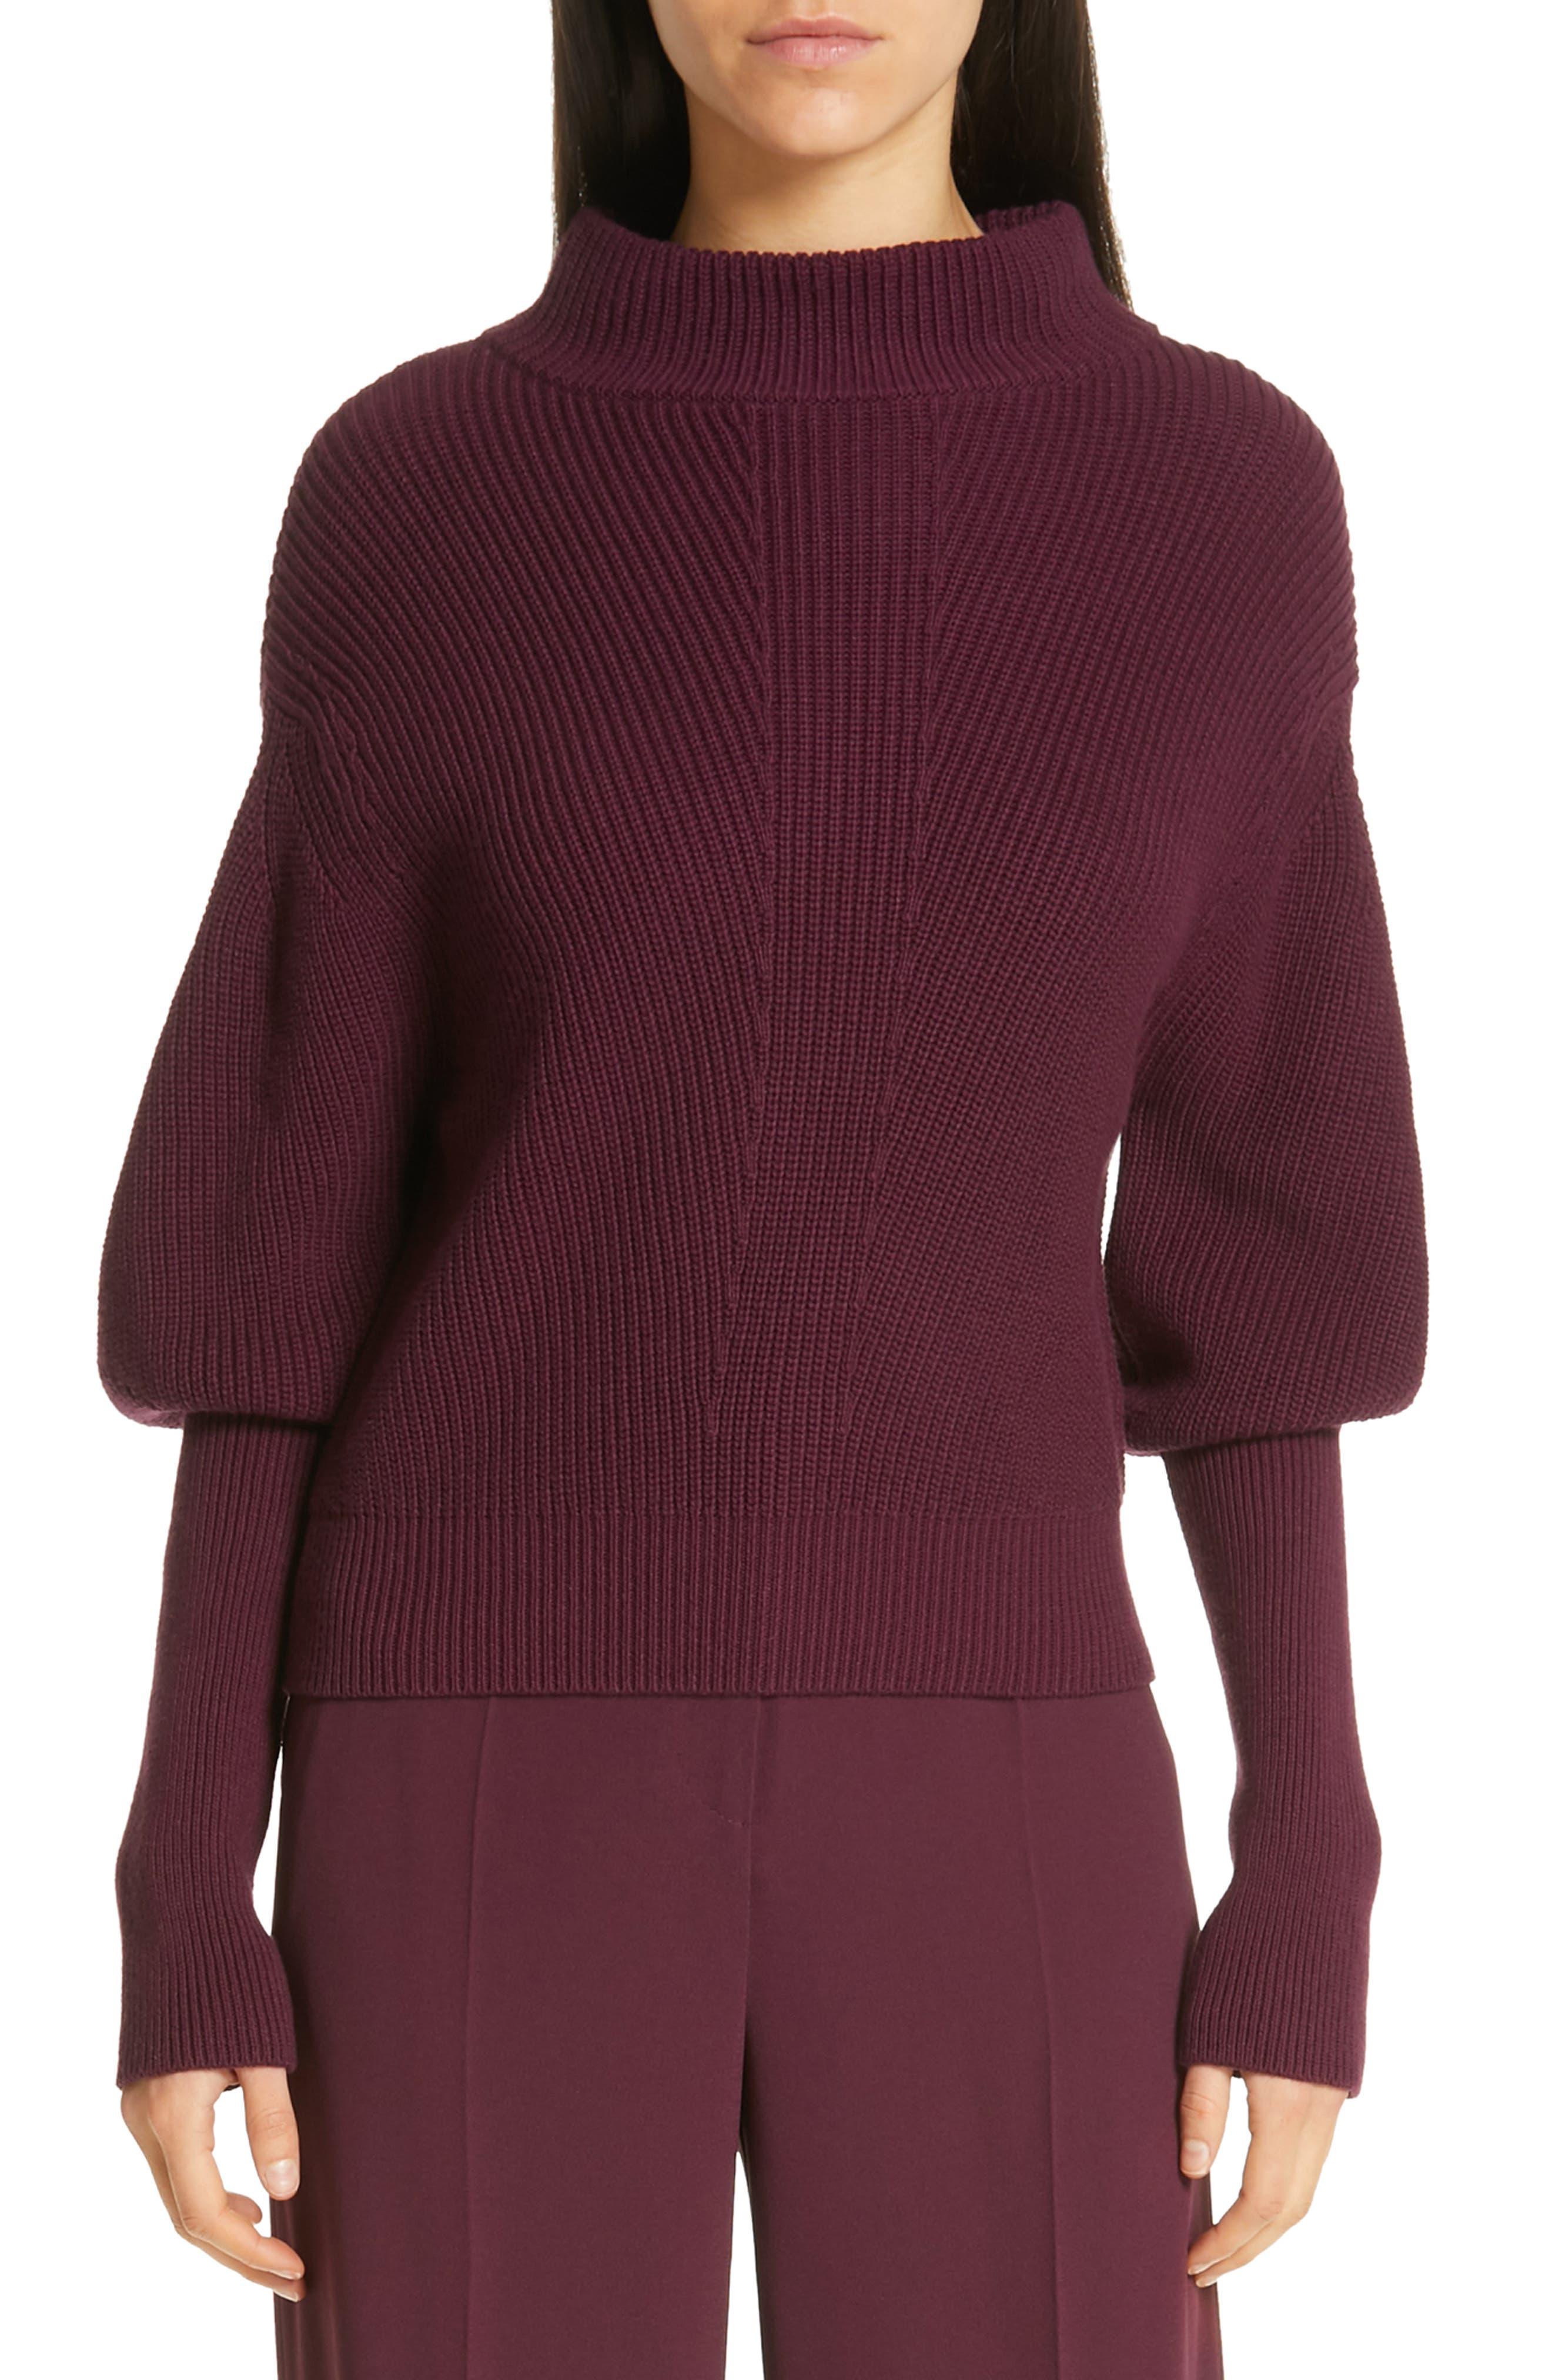 Flix Balloon Sleeve Sweater, Main, color, DARK BERRY